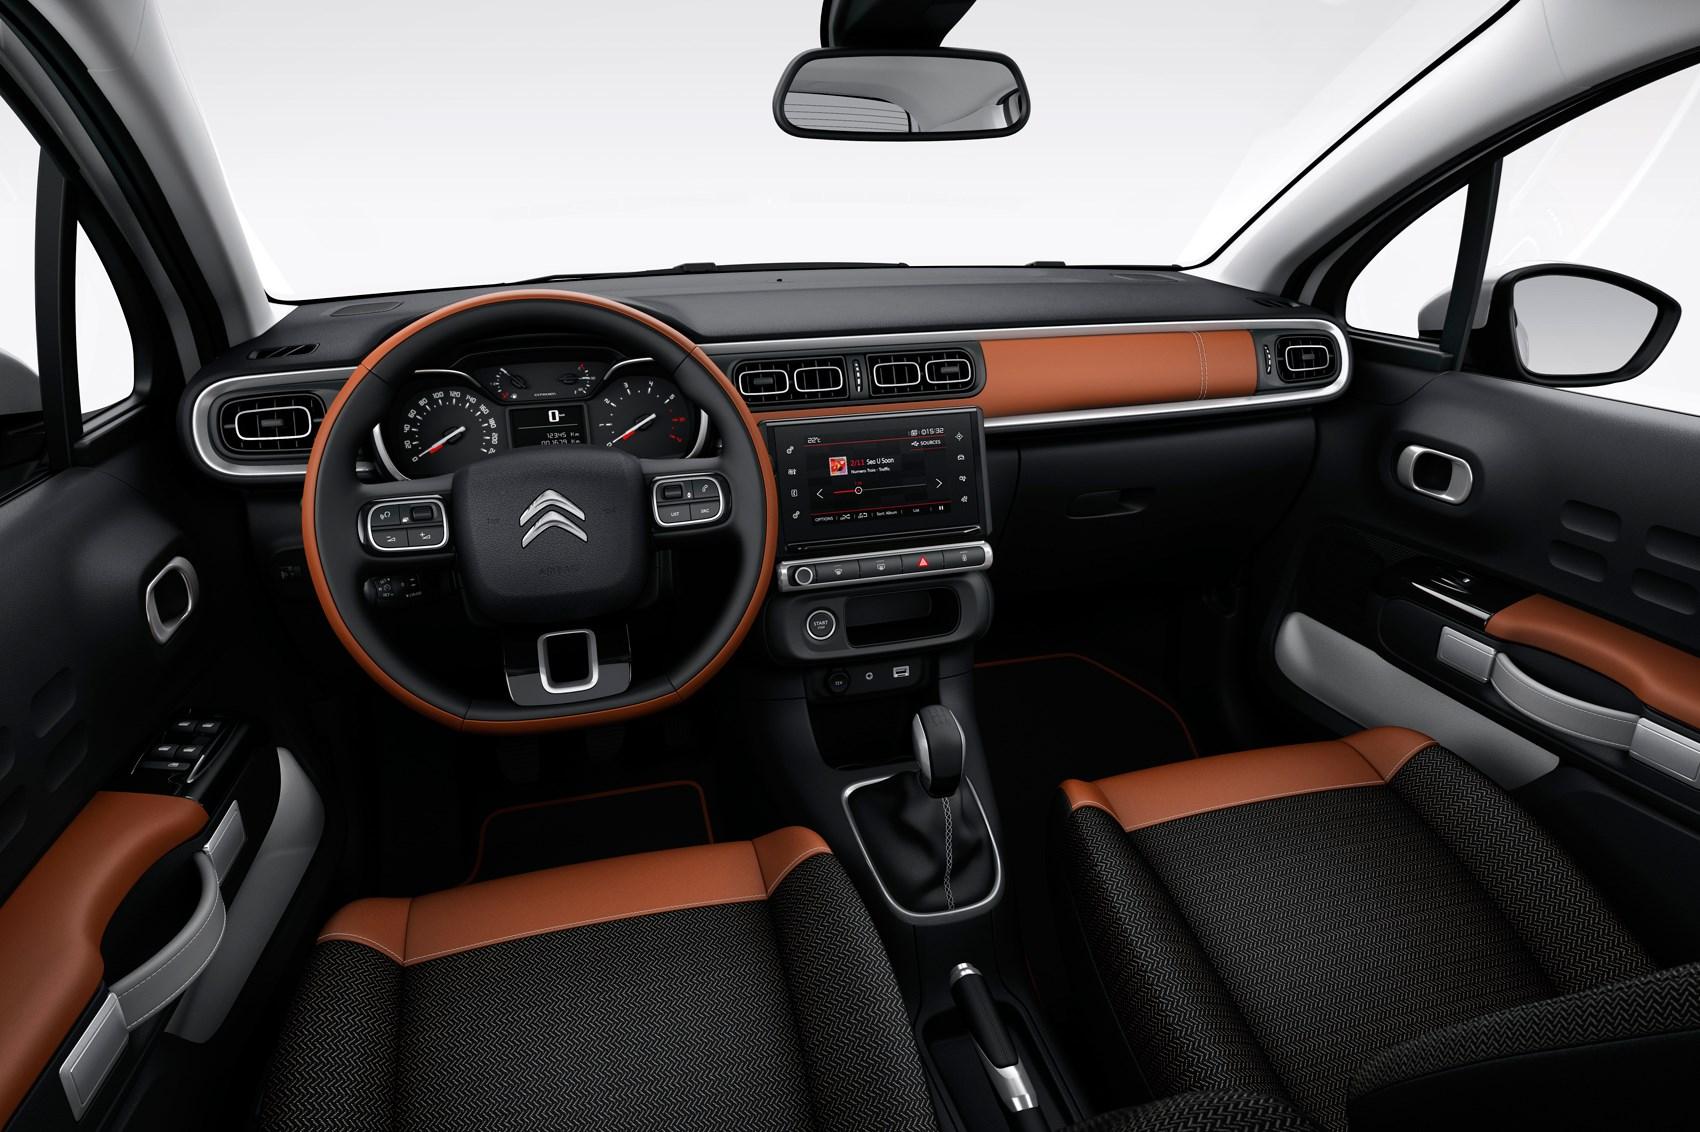 Технические характеристики, расход топлива автомобилей.